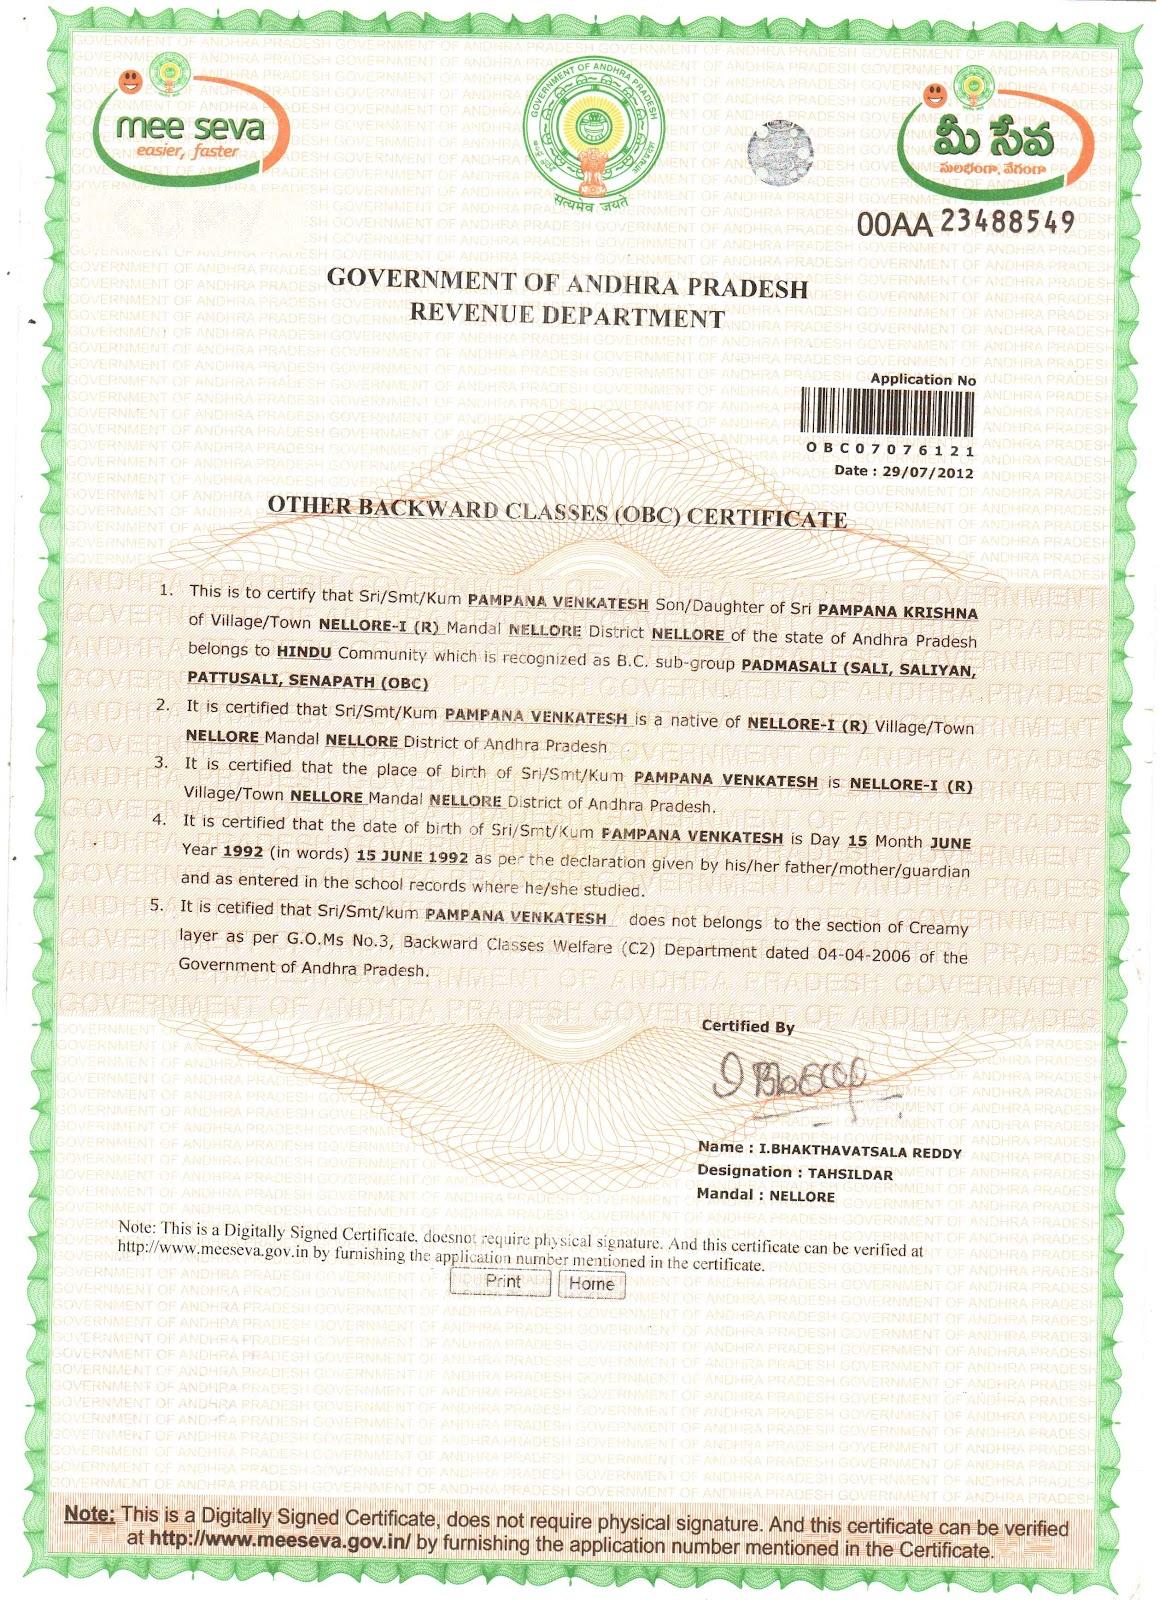 Online Income: Mee Seva Online Income Certificate